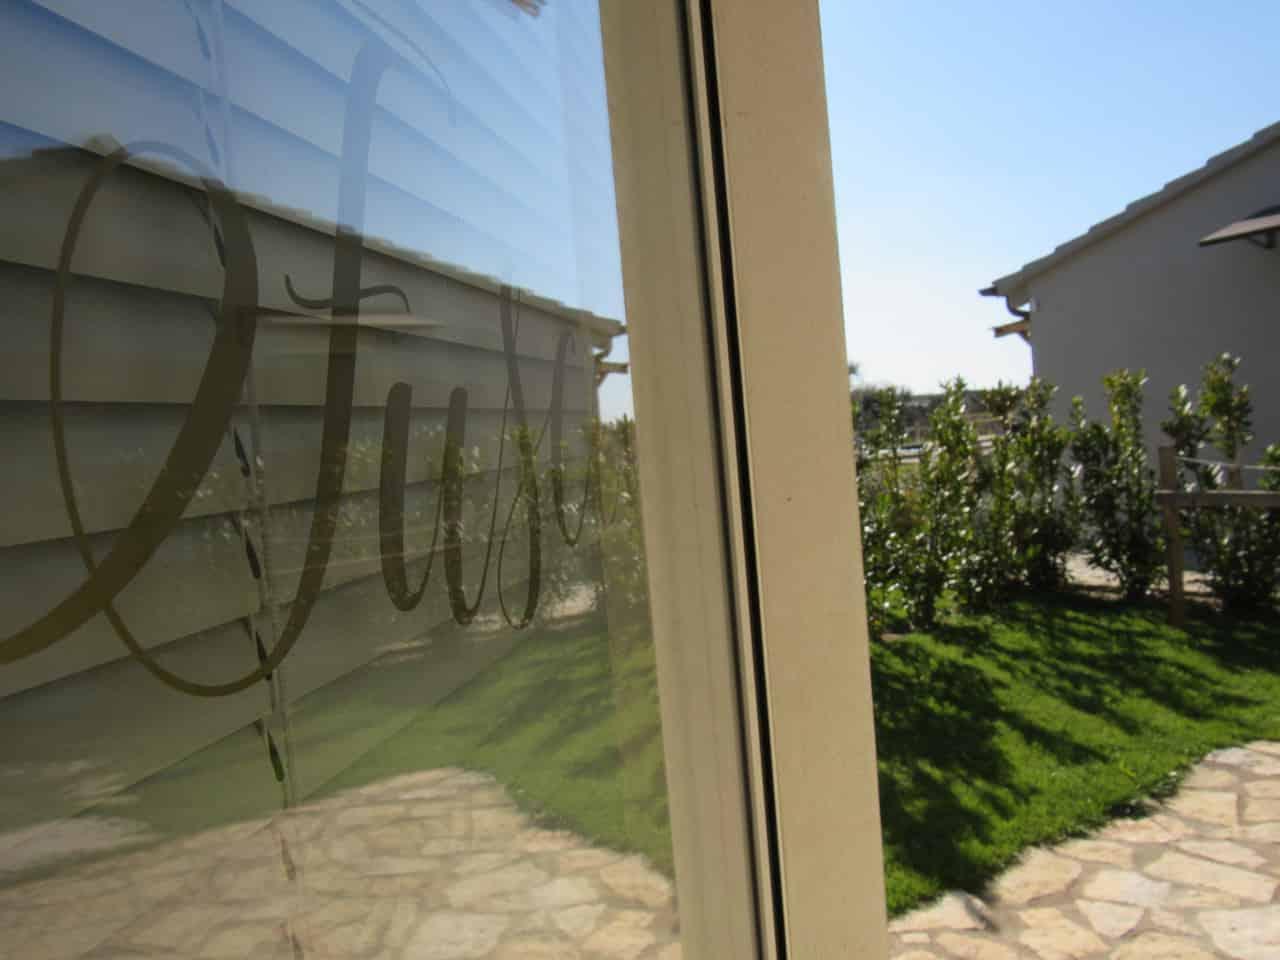 fuscella-mangiatoia-sweet-cottage-2